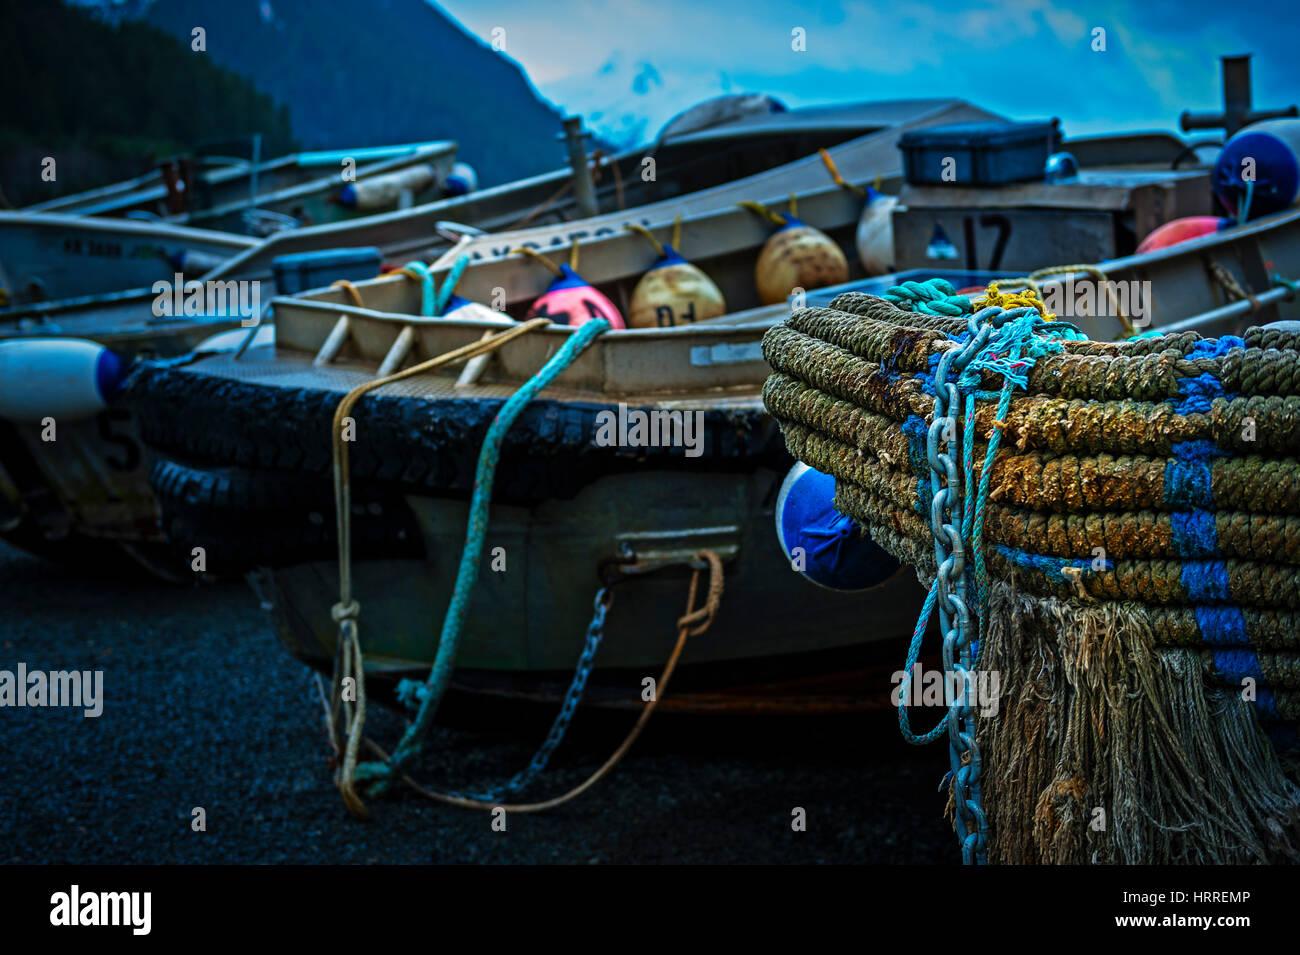 Marlinspike on bow of idle purse seiner skiff near Sitka, Alaska, USA. Photography by Jeffrey Wickett, NorthLight - Stock Image